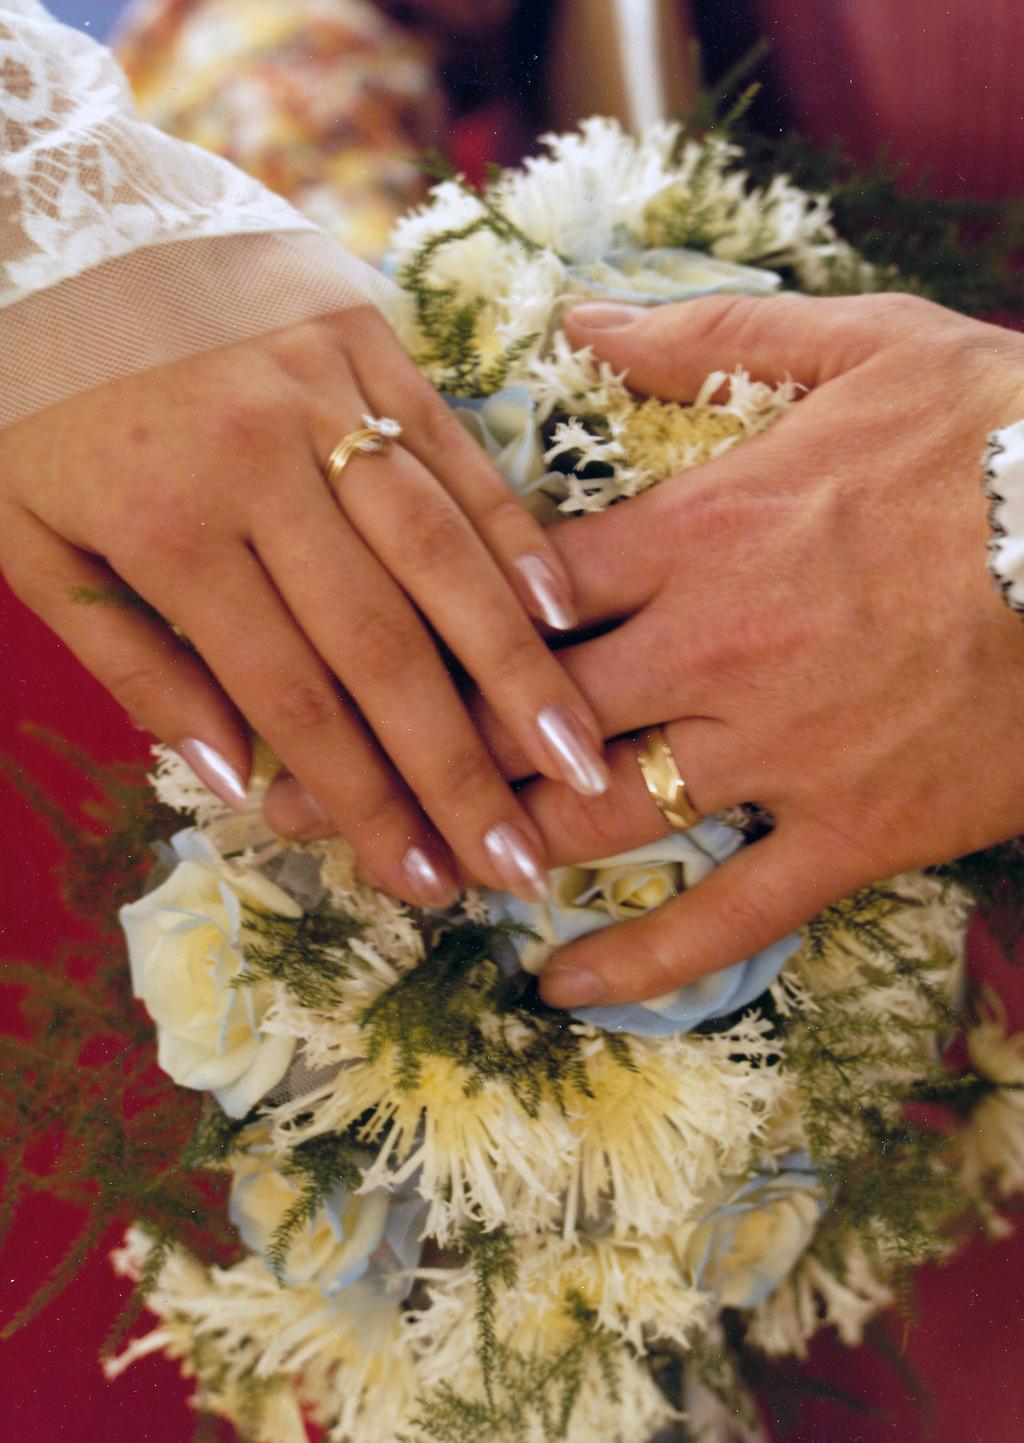 Jk_wedding_hands.full